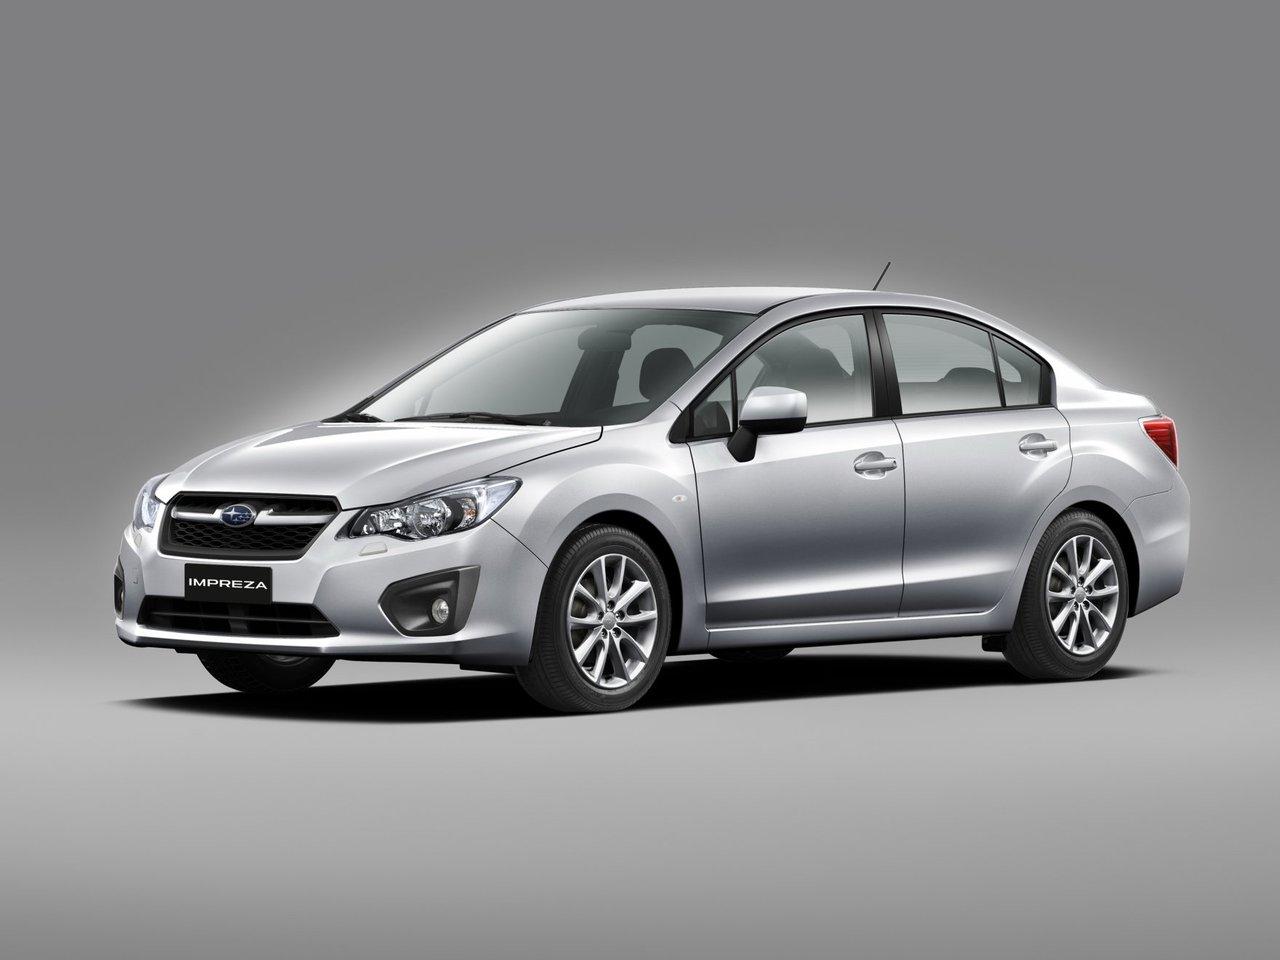 Снимки: Subaru Impreza 4